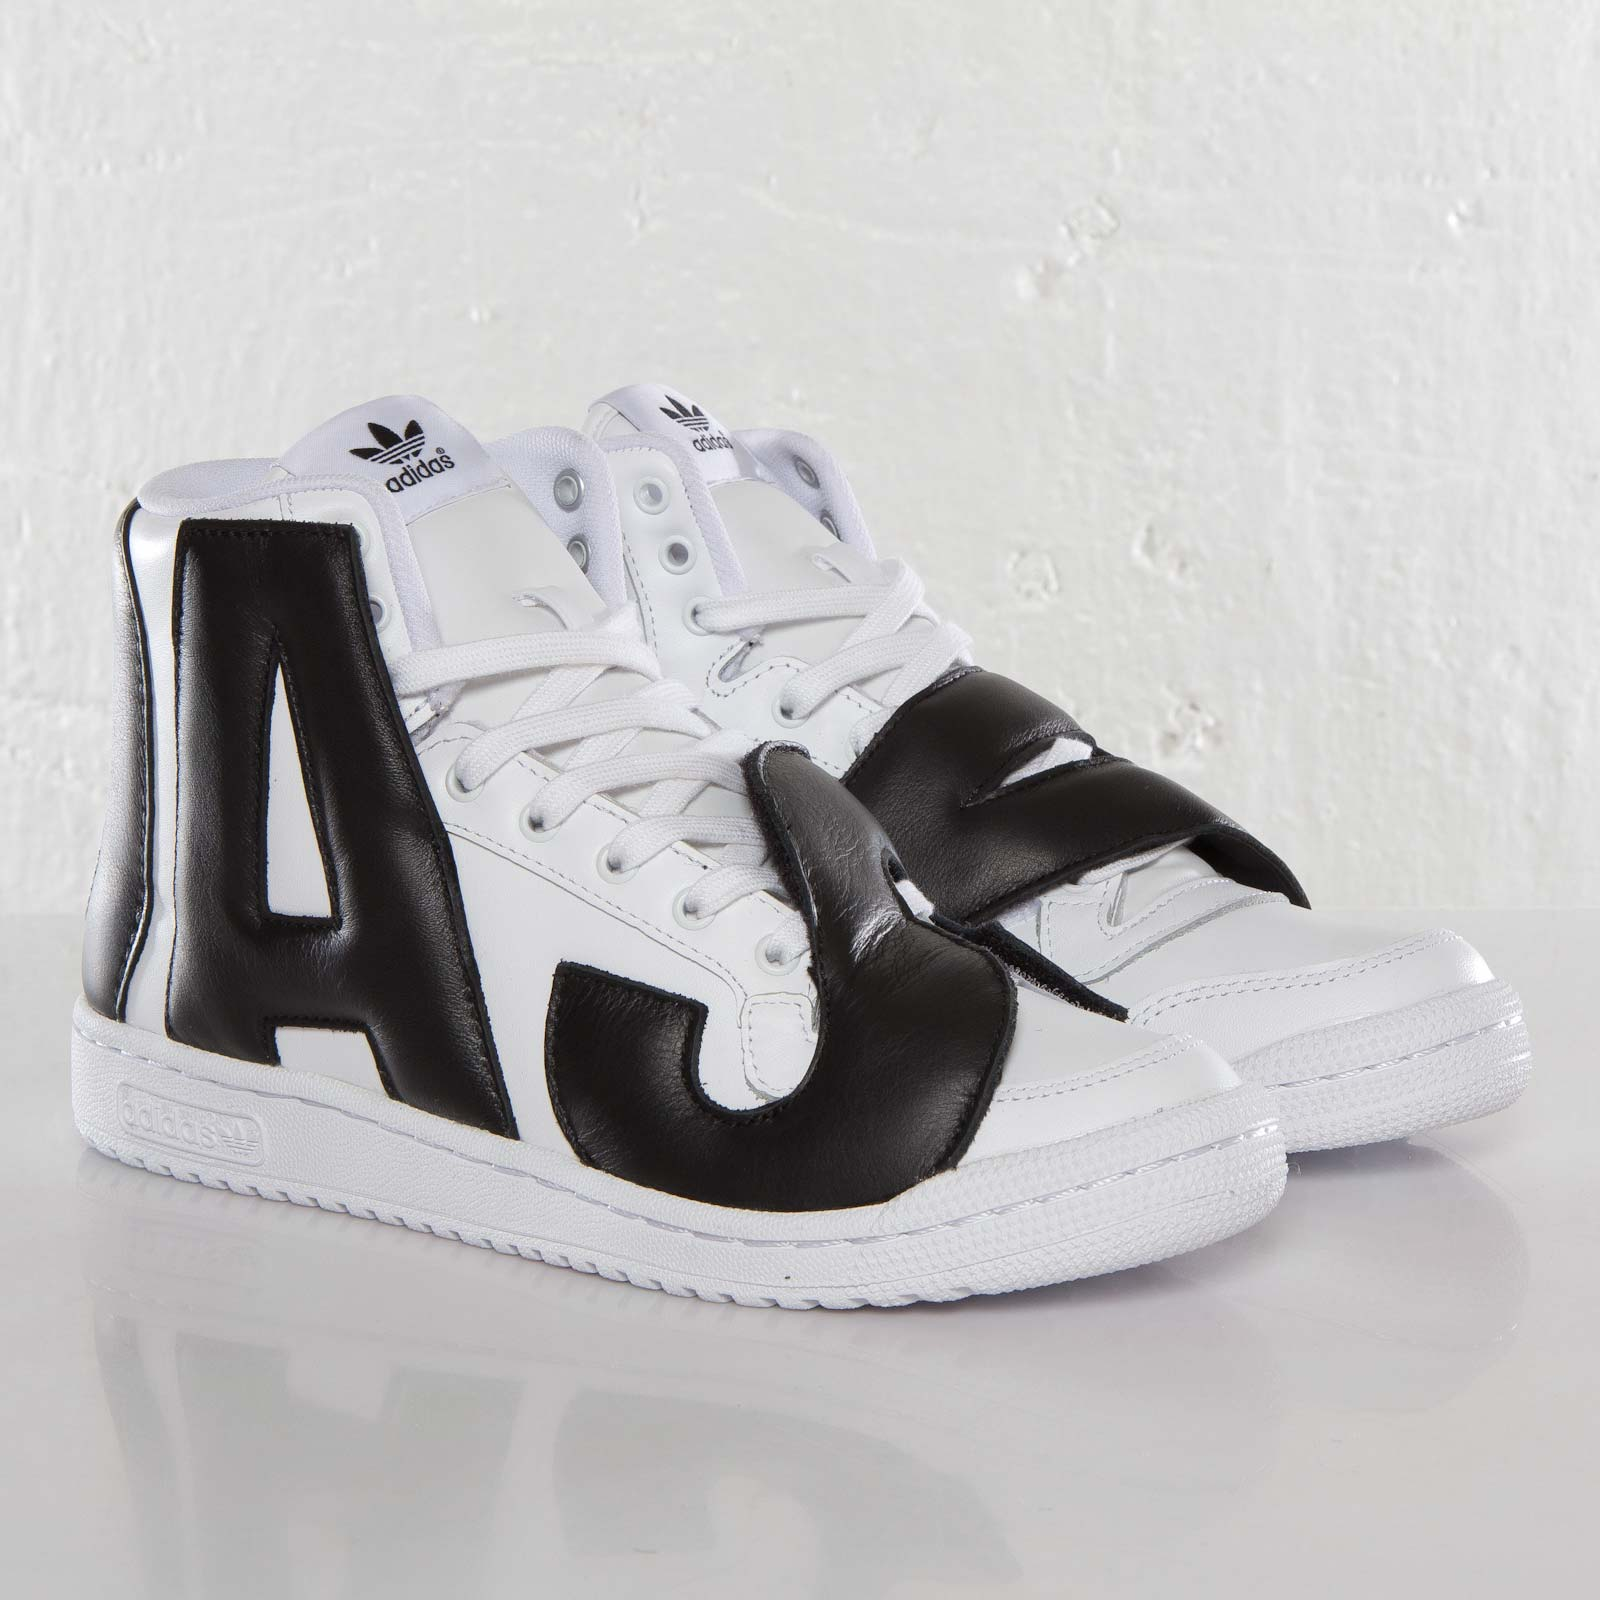 ab94c7466bd3 adidas JS Letters - Q34114 - Sneakersnstuff